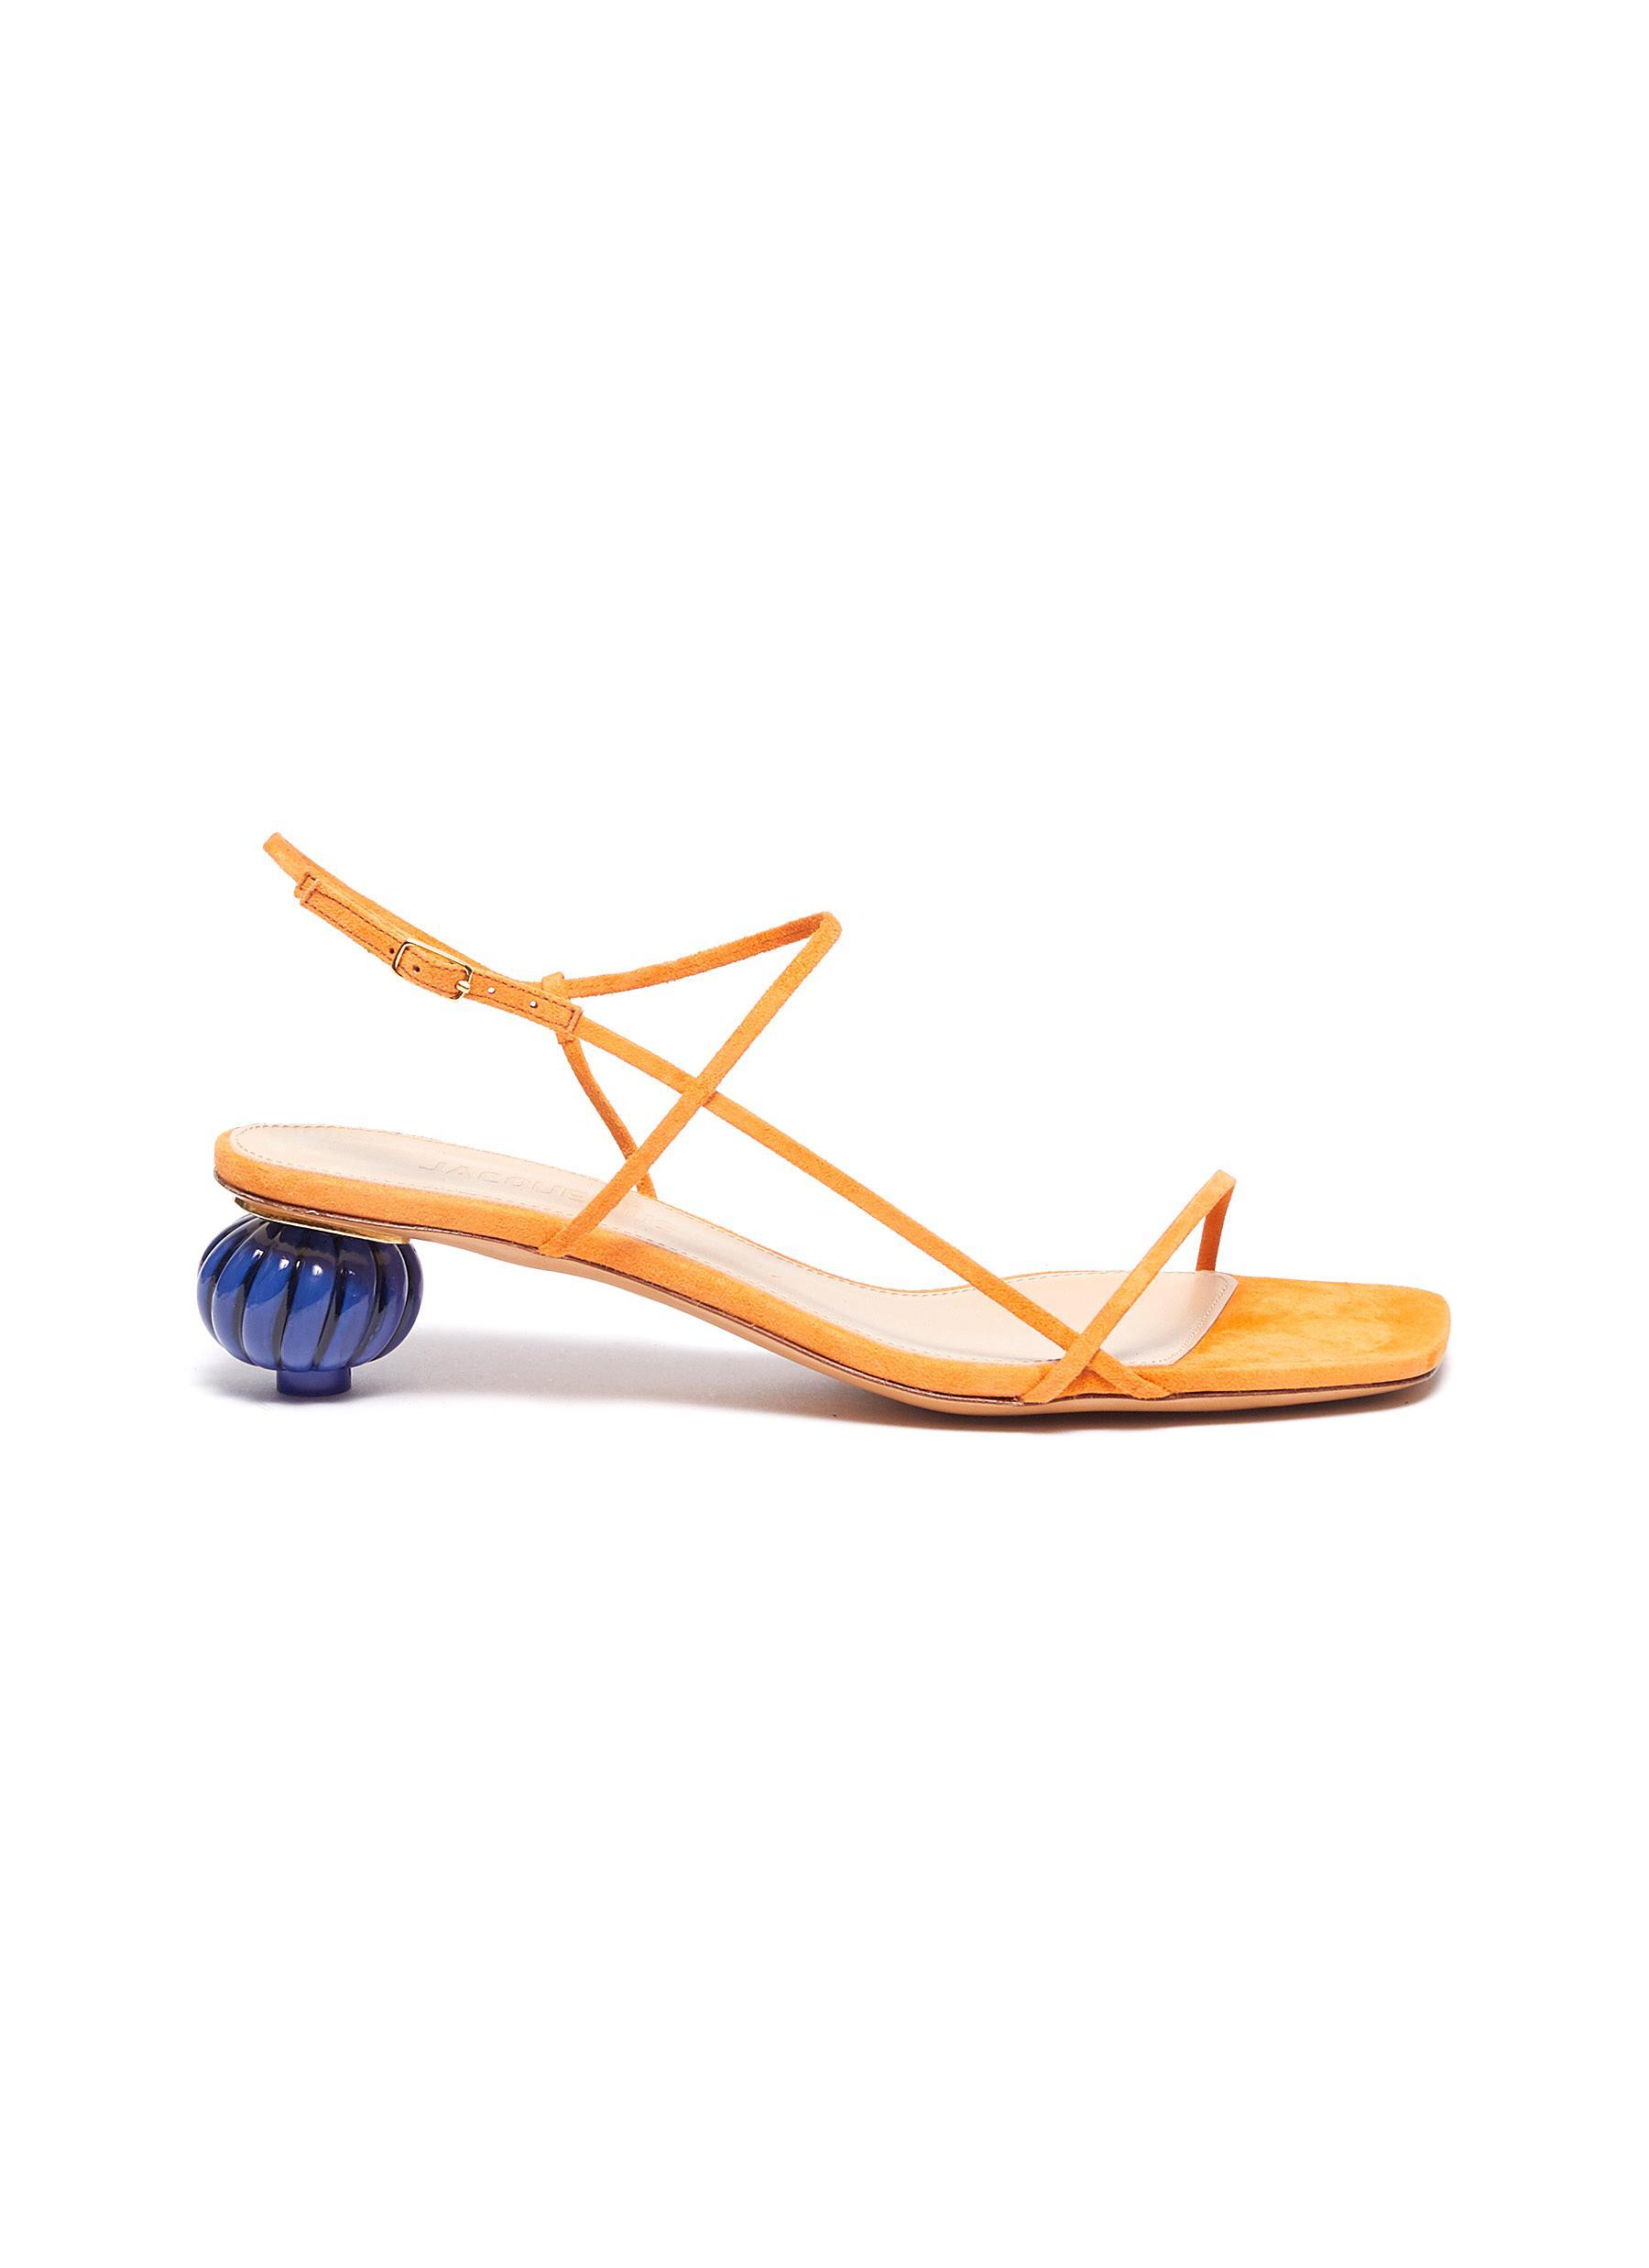 Jacquemus Low Heels Les Sandales asymmetric heel strappy sandals